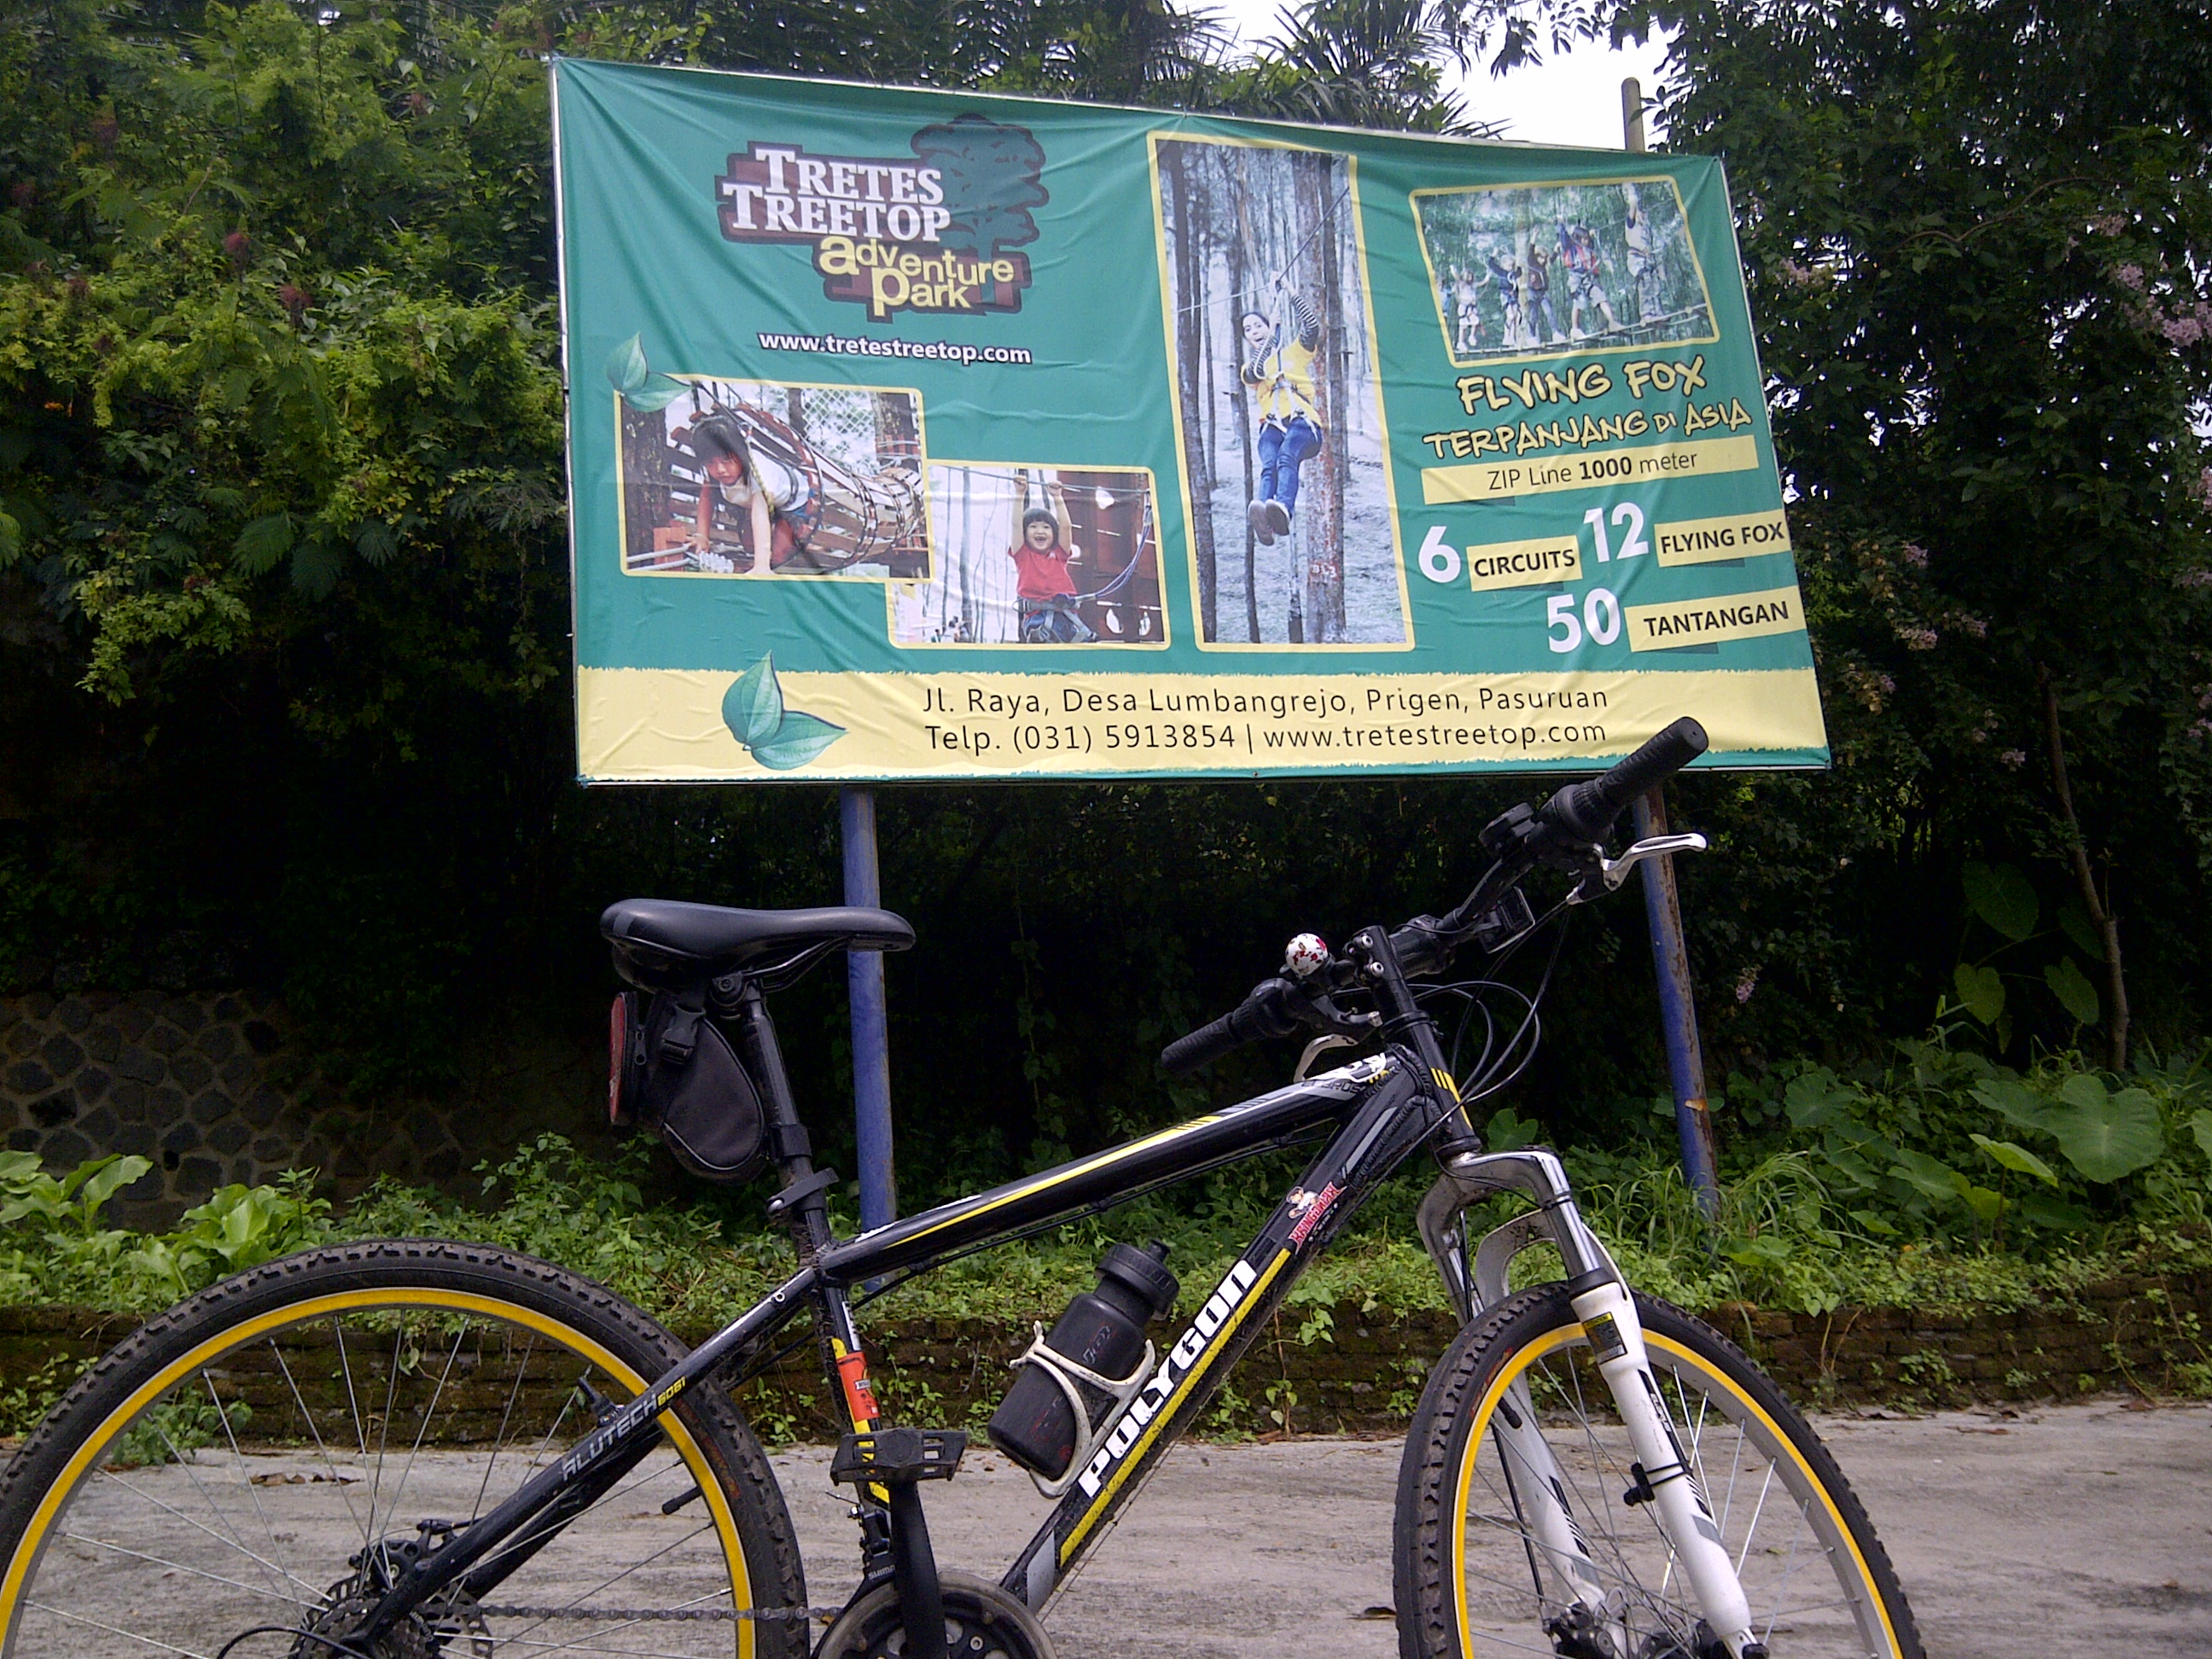 Jolotundo Yuk Kita Sepedaan Img 20150301 06829 Tretes Treetop Adventure